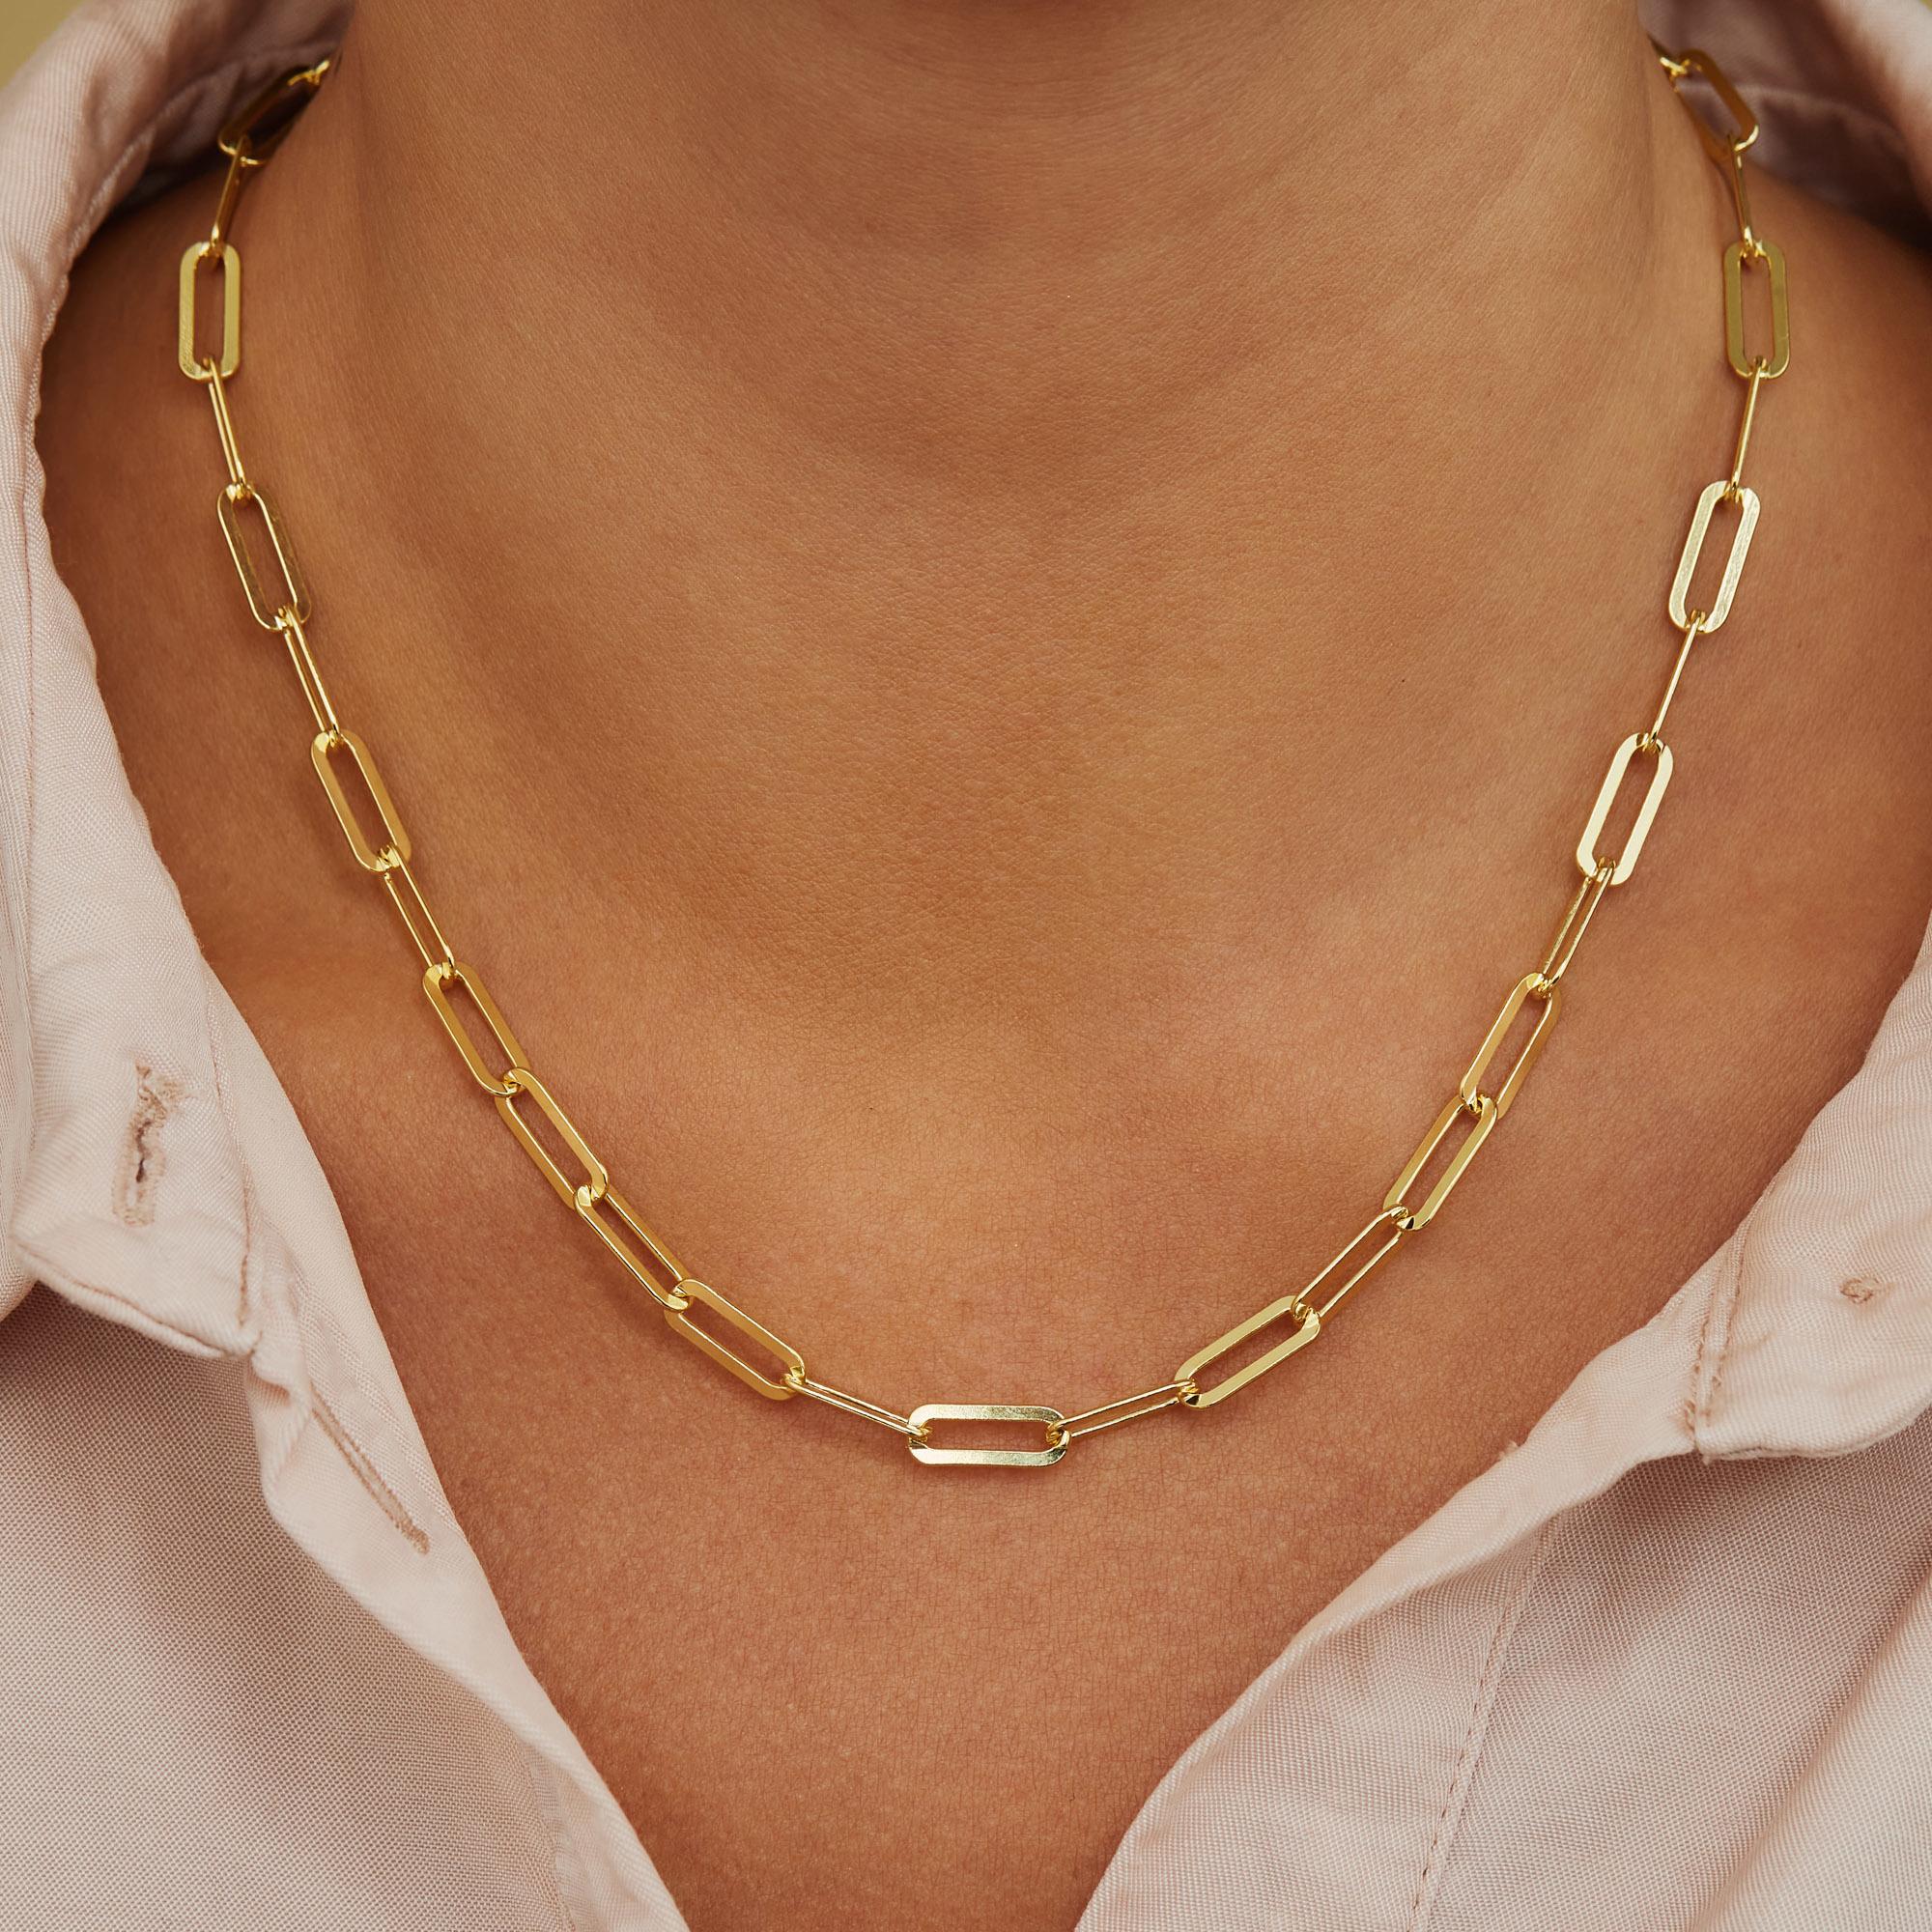 Selected Jewels Lizzy Maja 925 sterling silver guldfärgad halsband